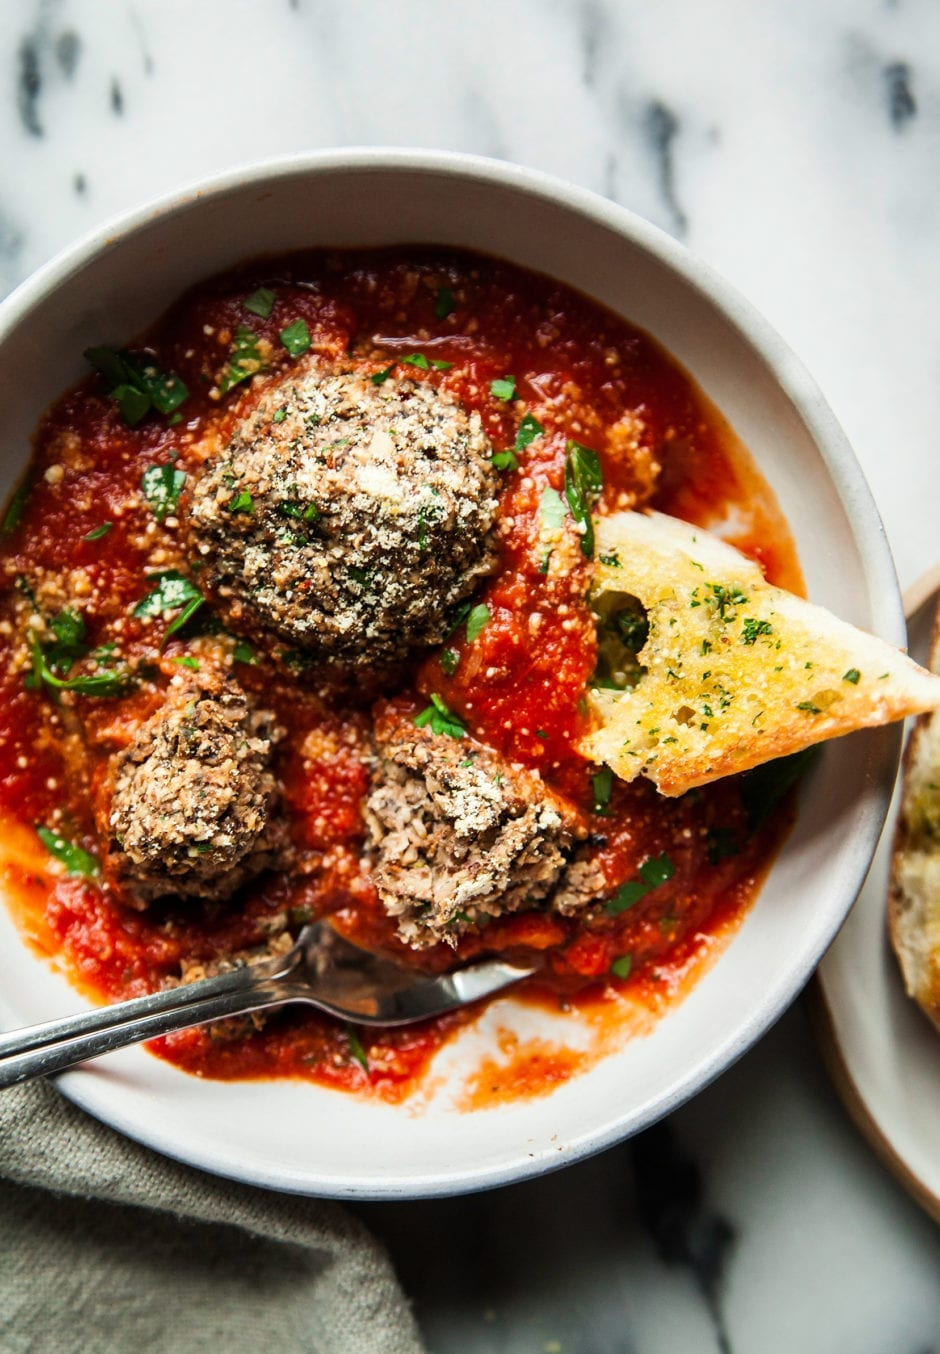 Giant Vegan Mushroom Meatballs Amp Garlic Bread 187 The First